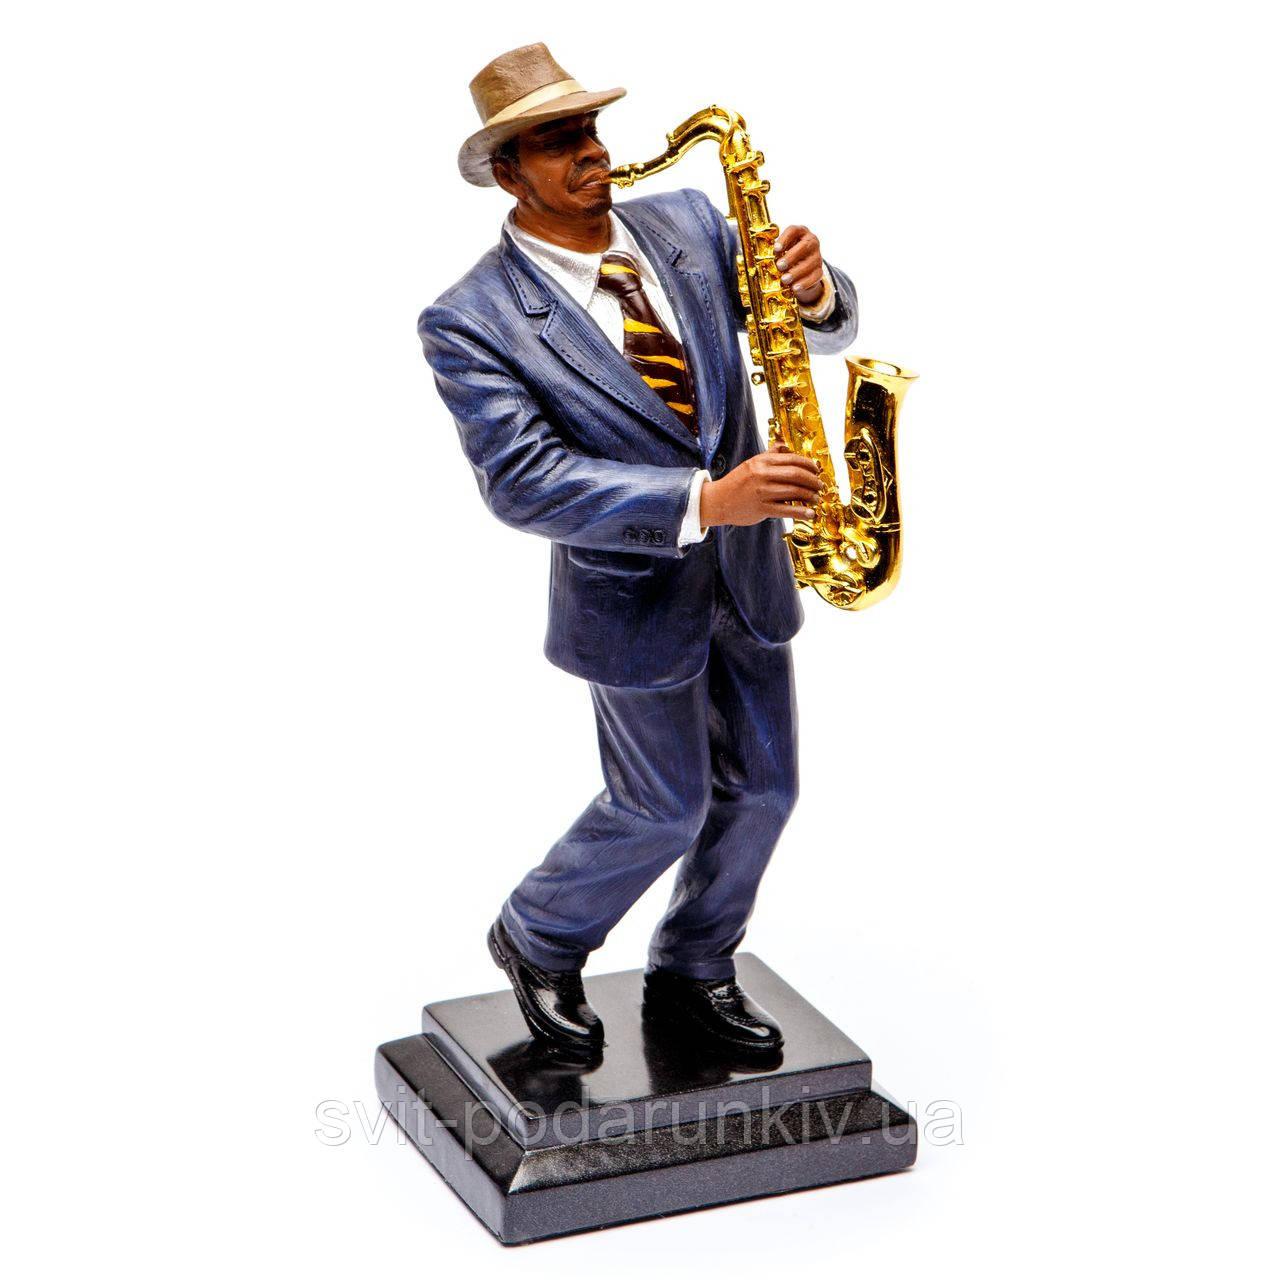 "Фигурка саксофонист ""Статуэтка музыканта играющего на саксофоне"" S529"